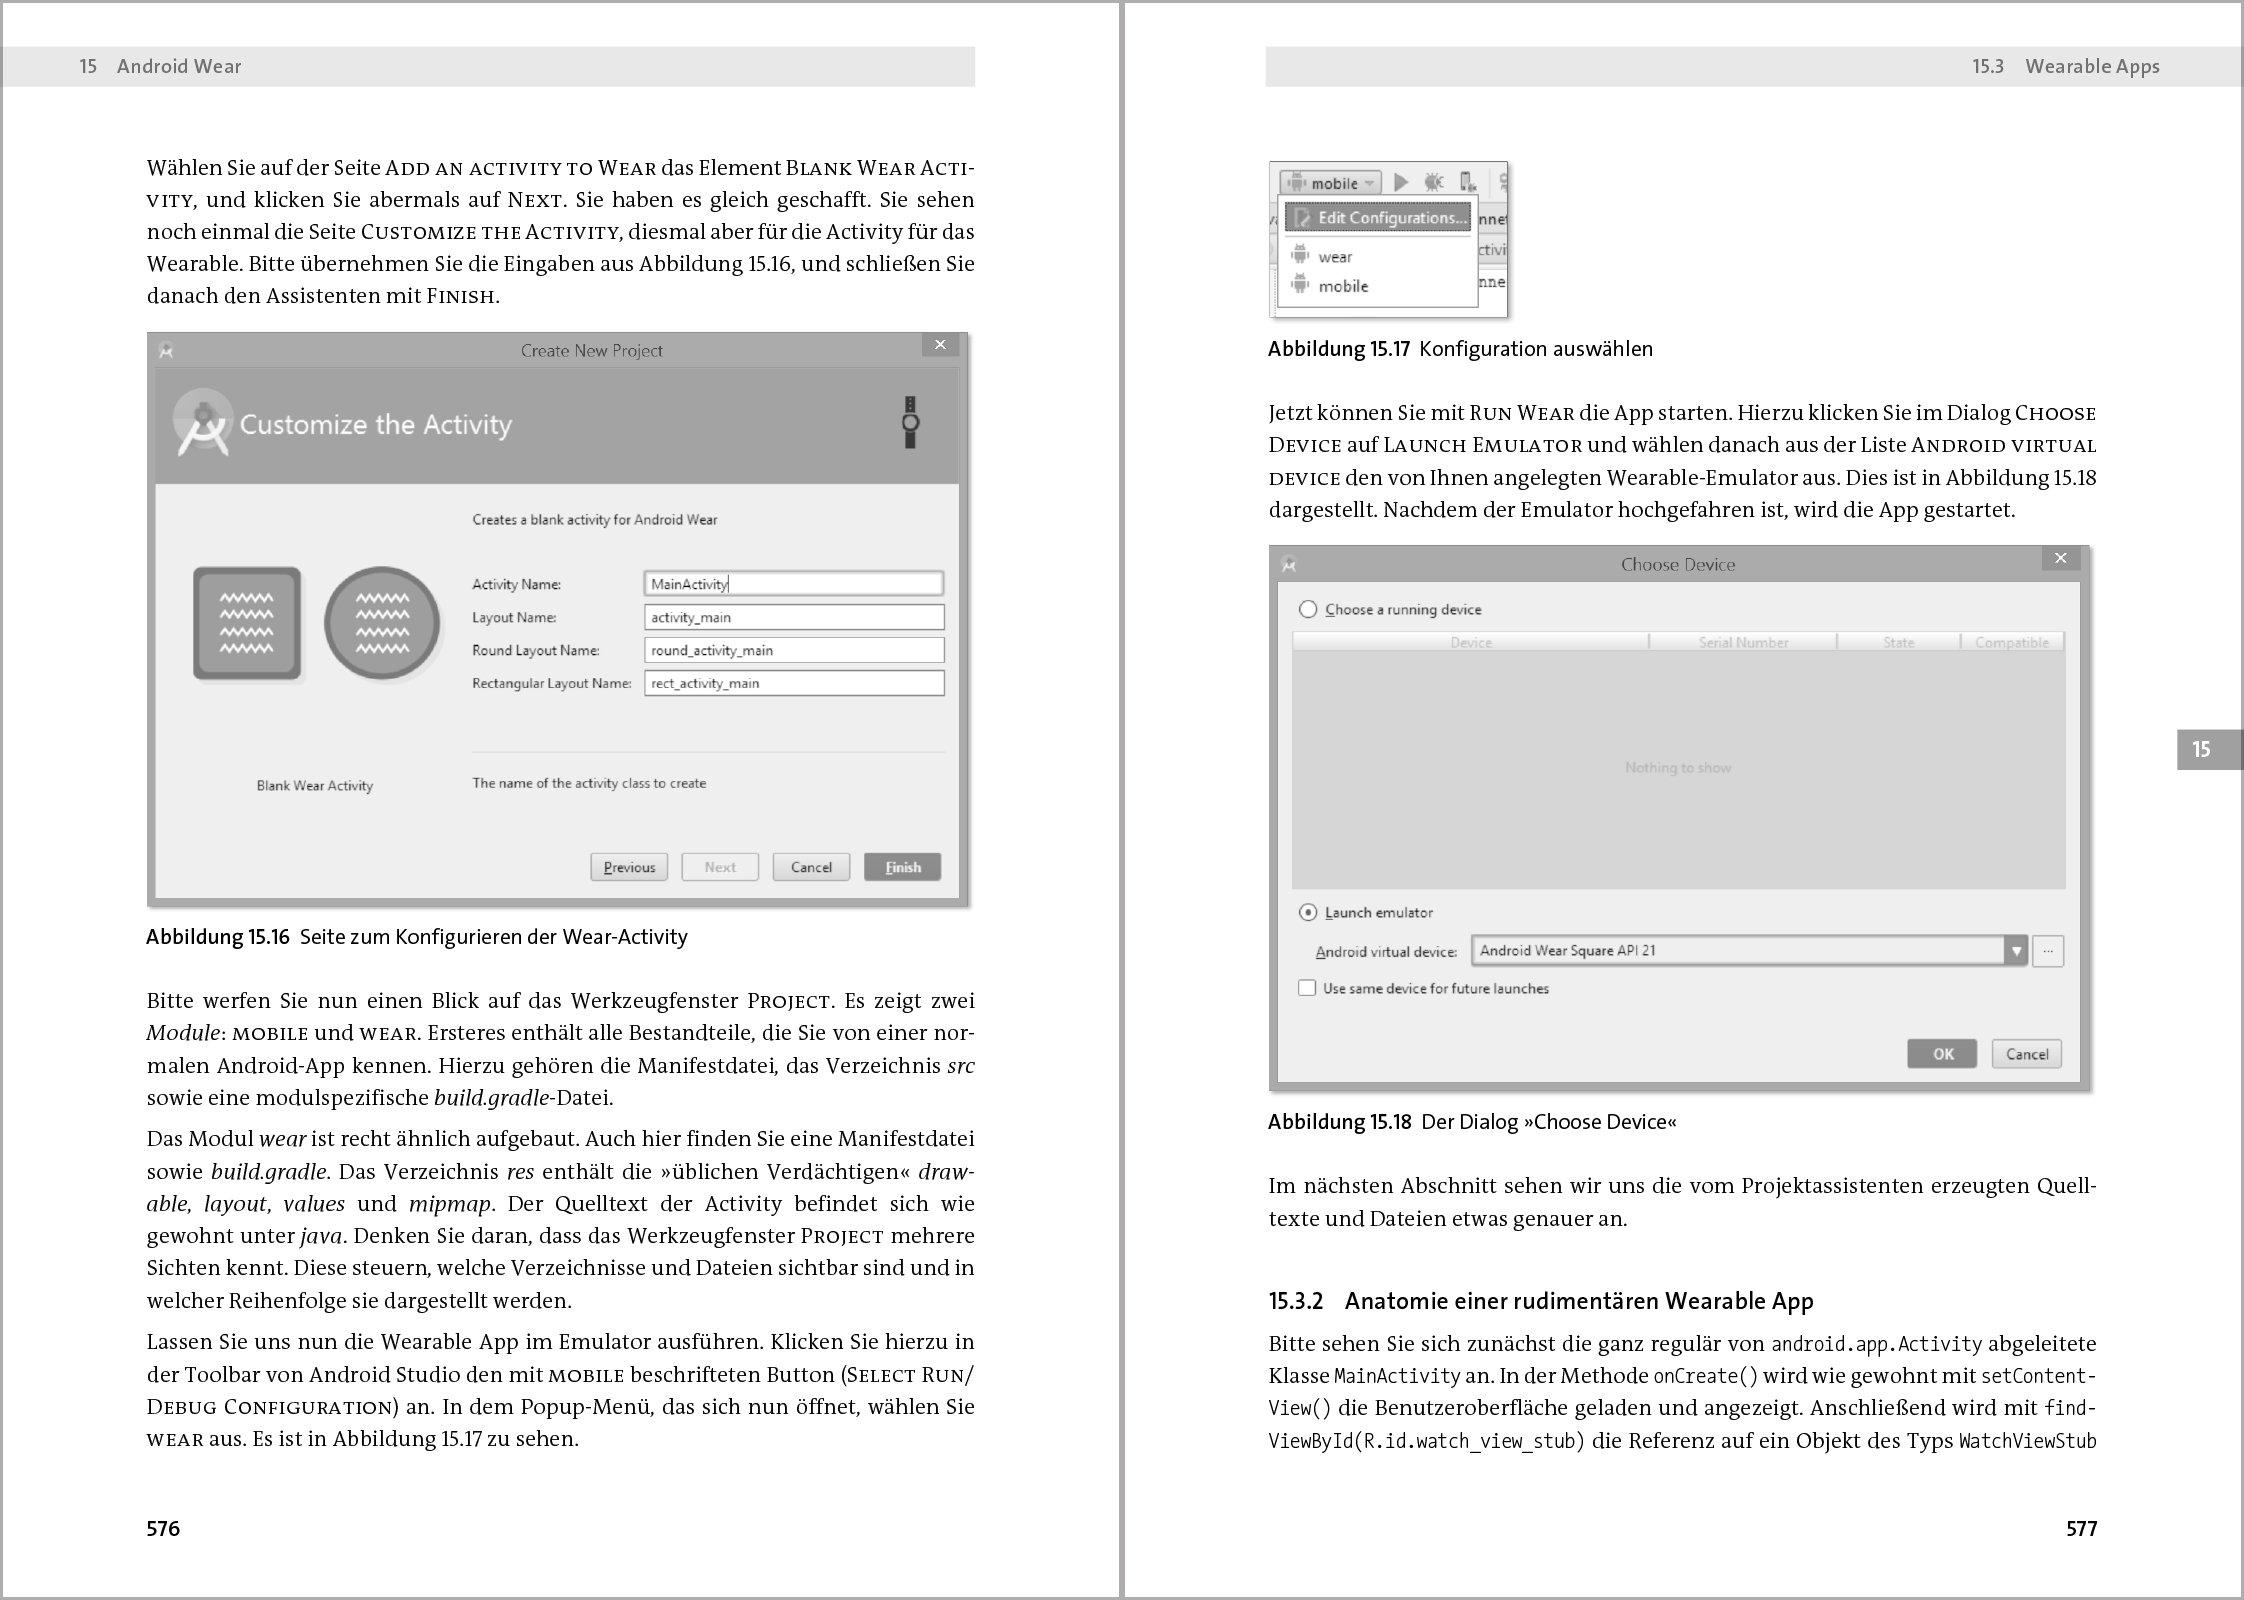 Schön Anatomie Apps Android Ideen - Anatomie Ideen - finotti.info